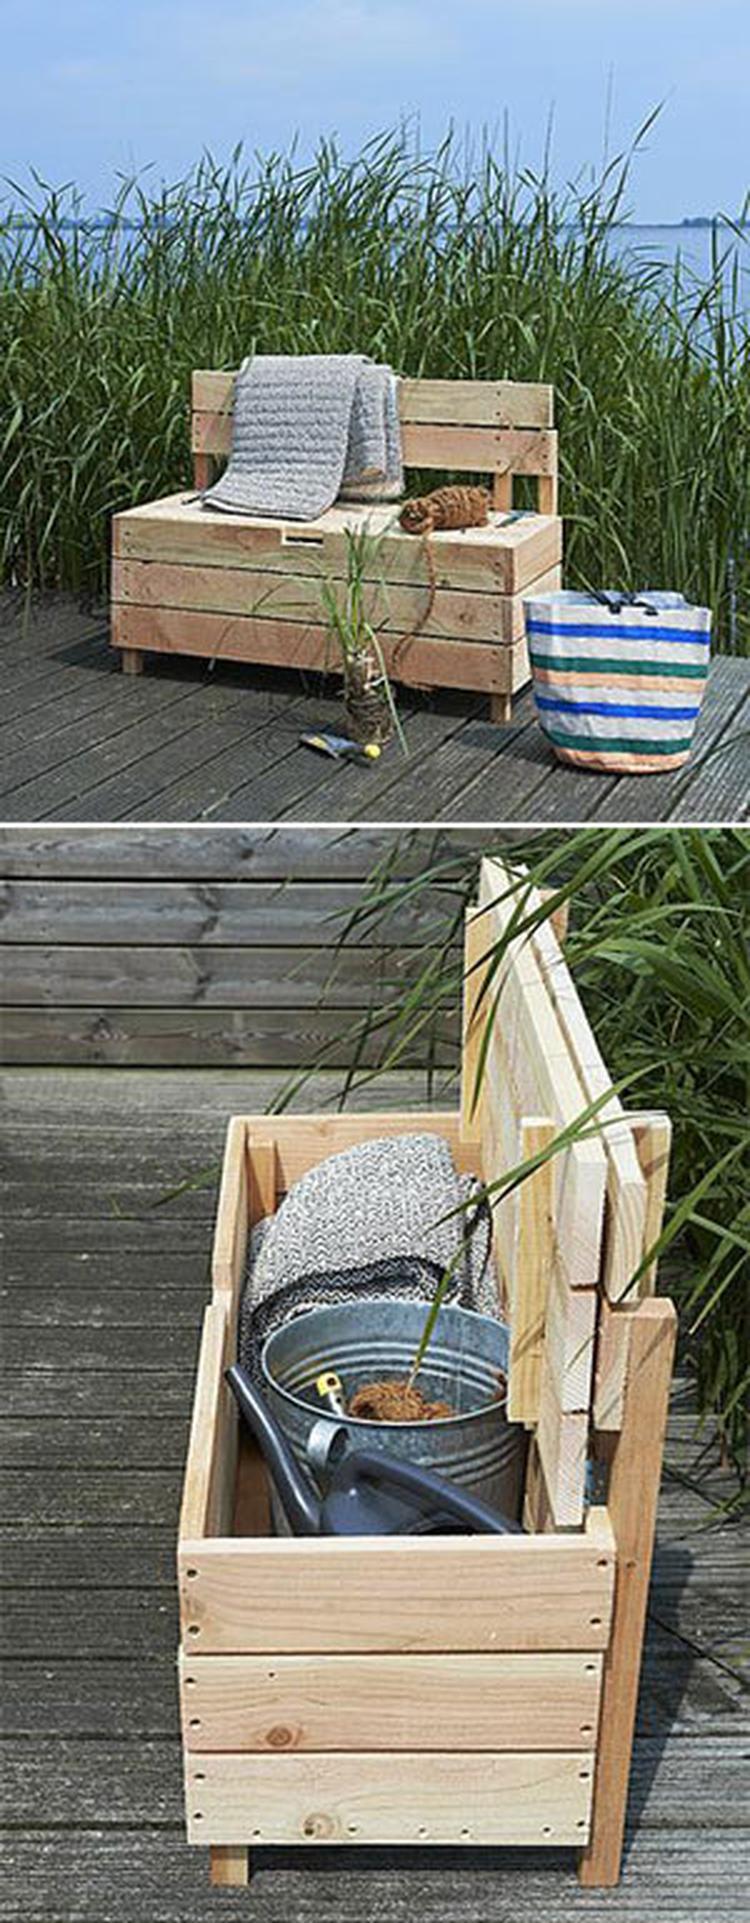 Tuinbankje maken tectake tuinbank tuin bank tuinbankje for Houten tuinbank zelf maken